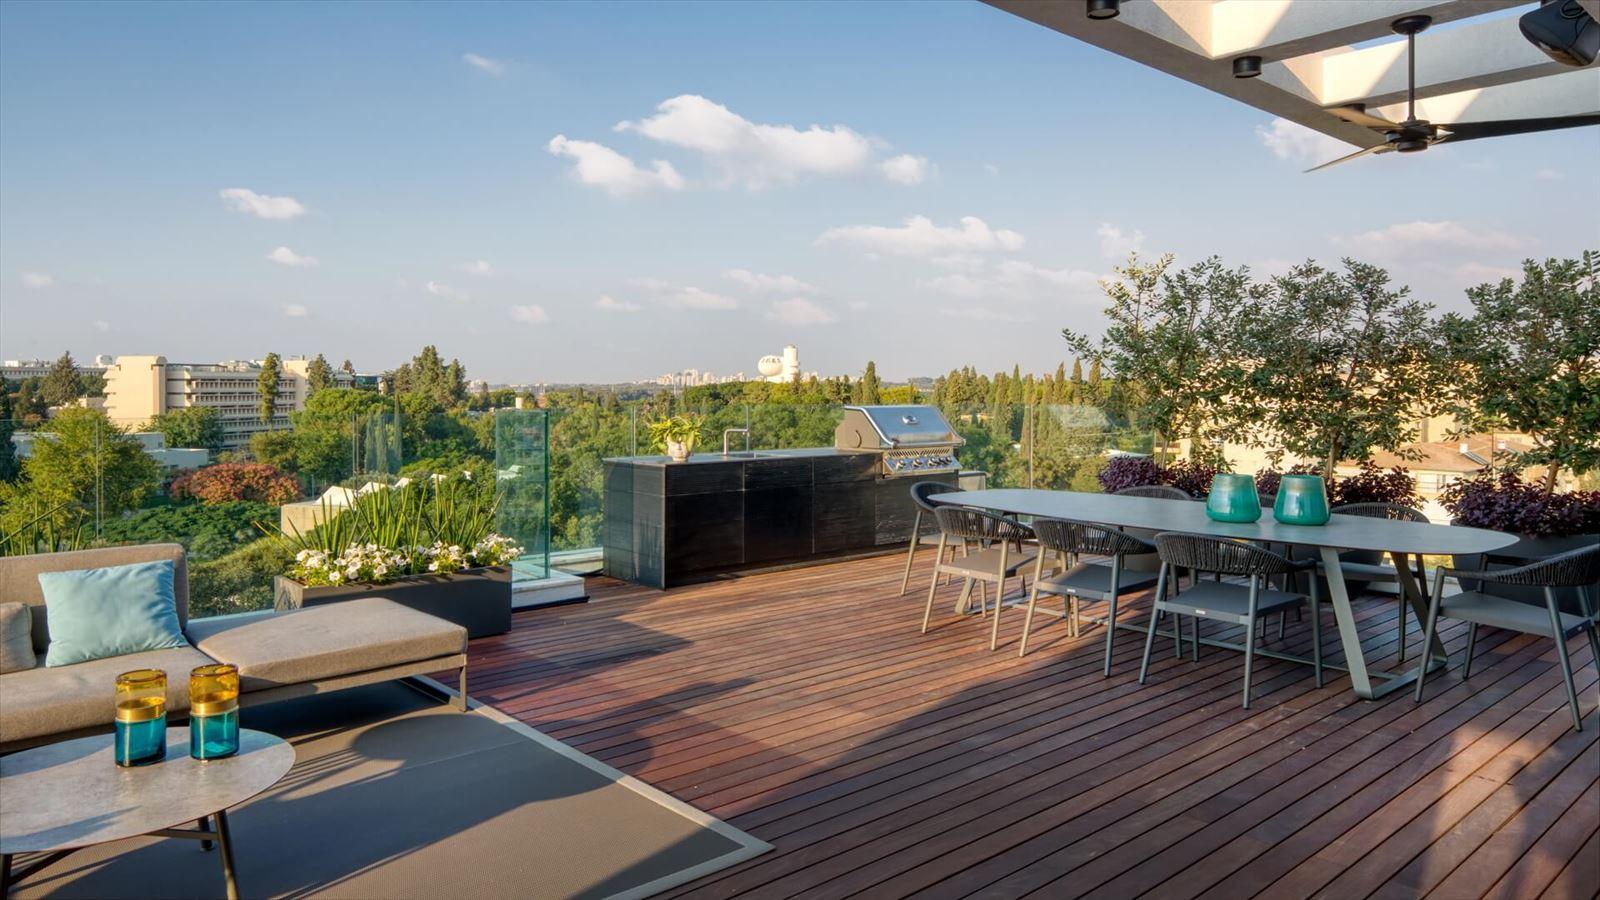 Penthouse Carmelit - עיצוב תאורת המרפסת על ידי קמחי דורי